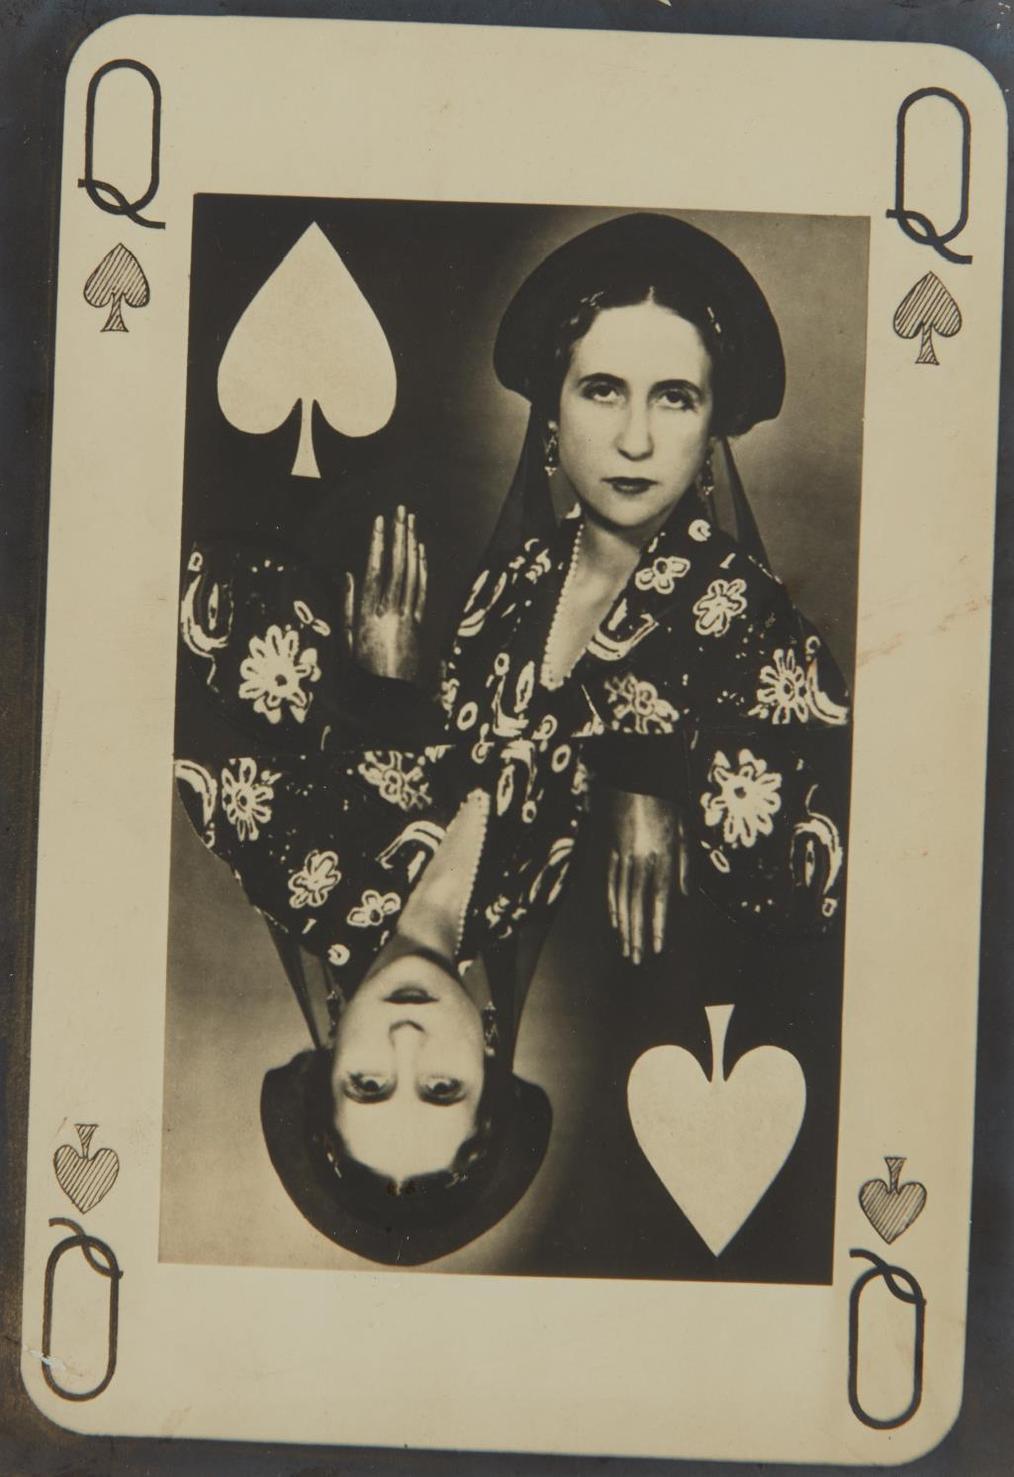 Man Ray-Lise Deharme En La Dame De Pique-1935